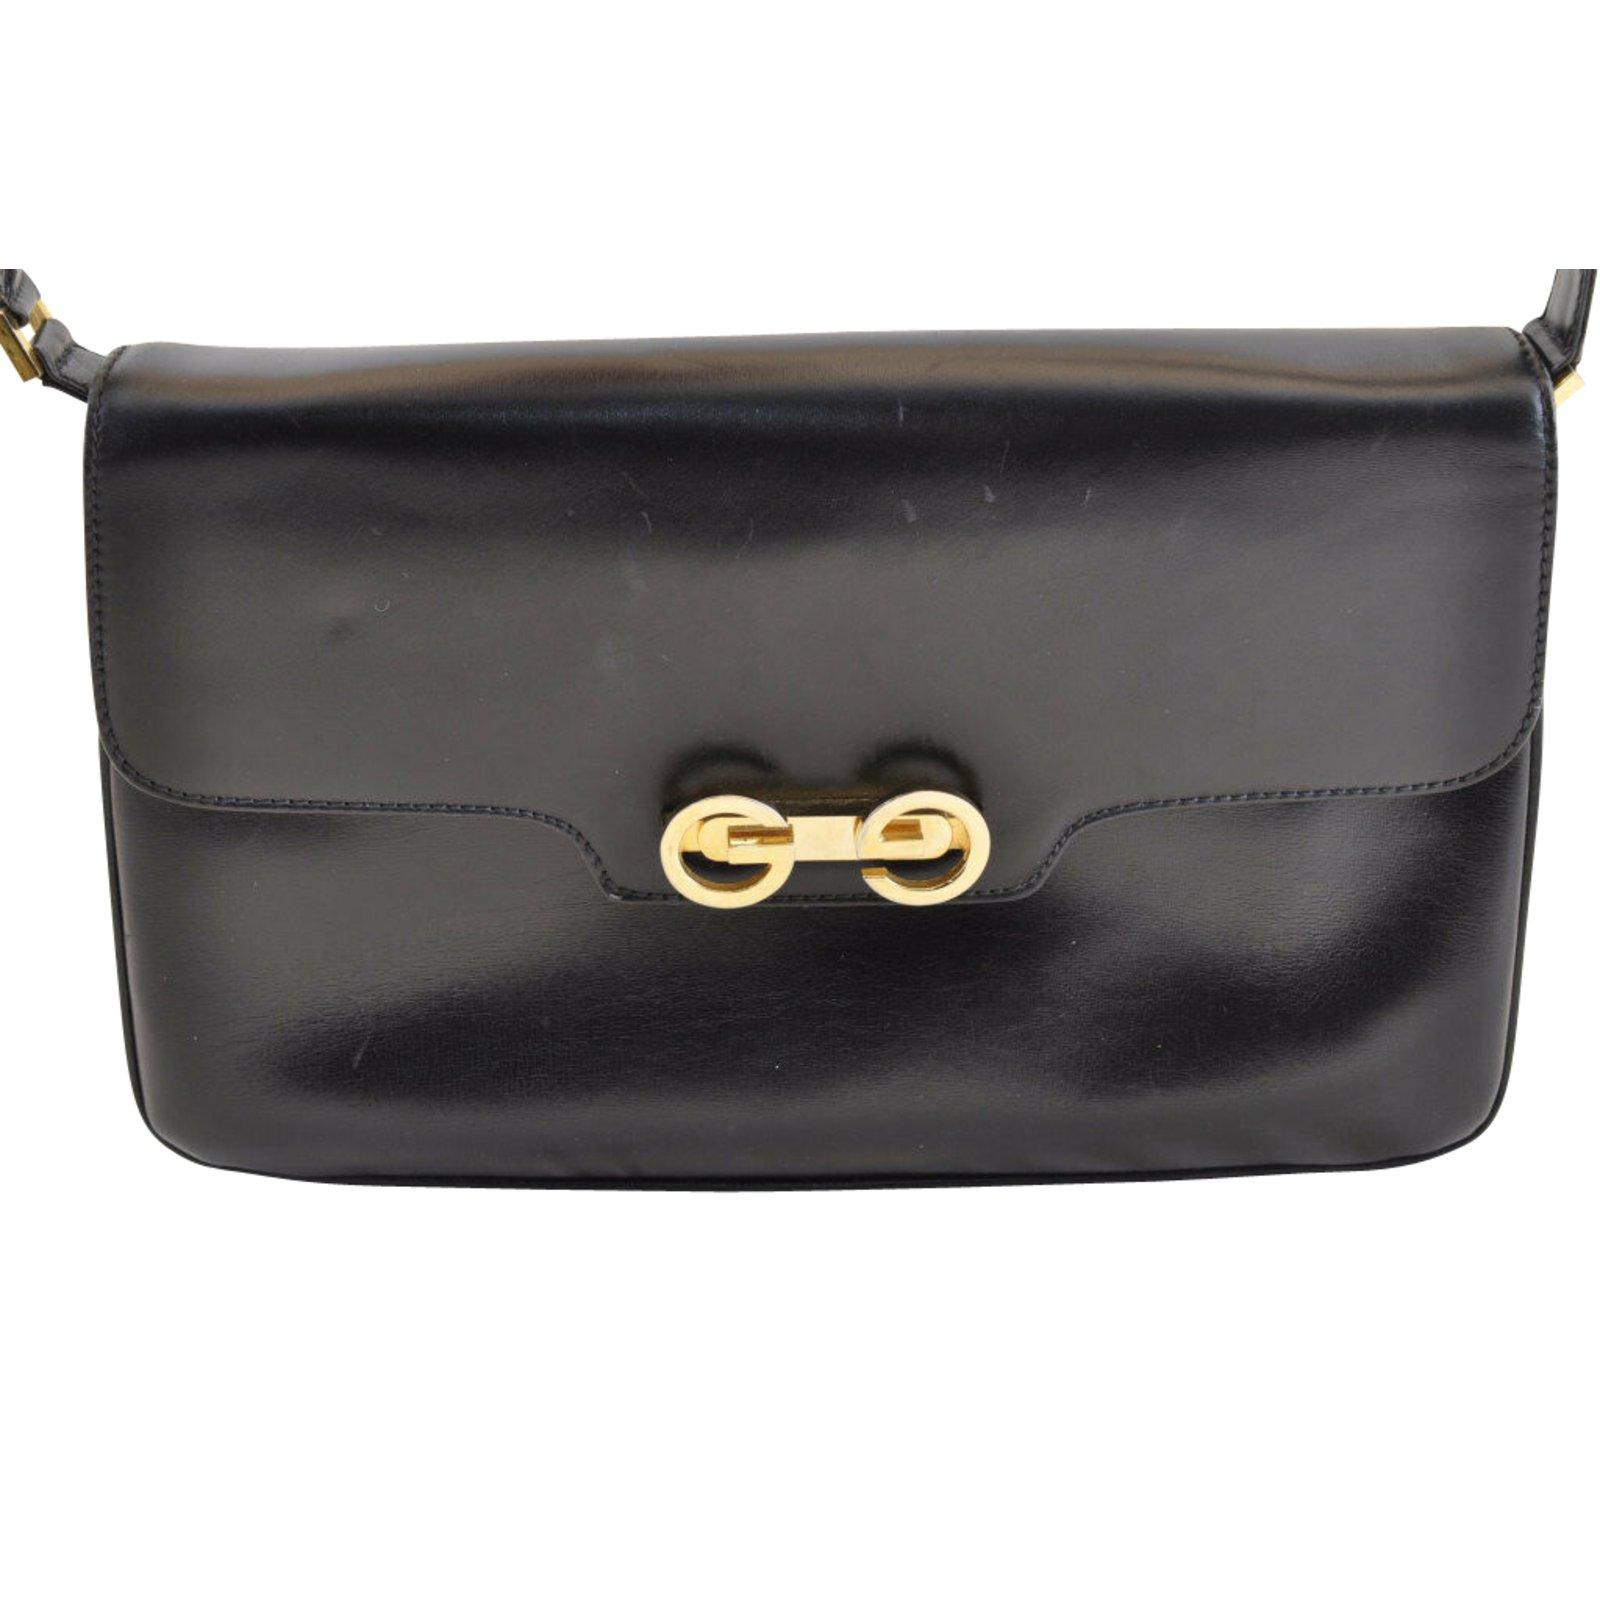 14336e18467a Sacs à main Gucci Sac bandoulière Cuir Noir ref.104138 - Joli Closet